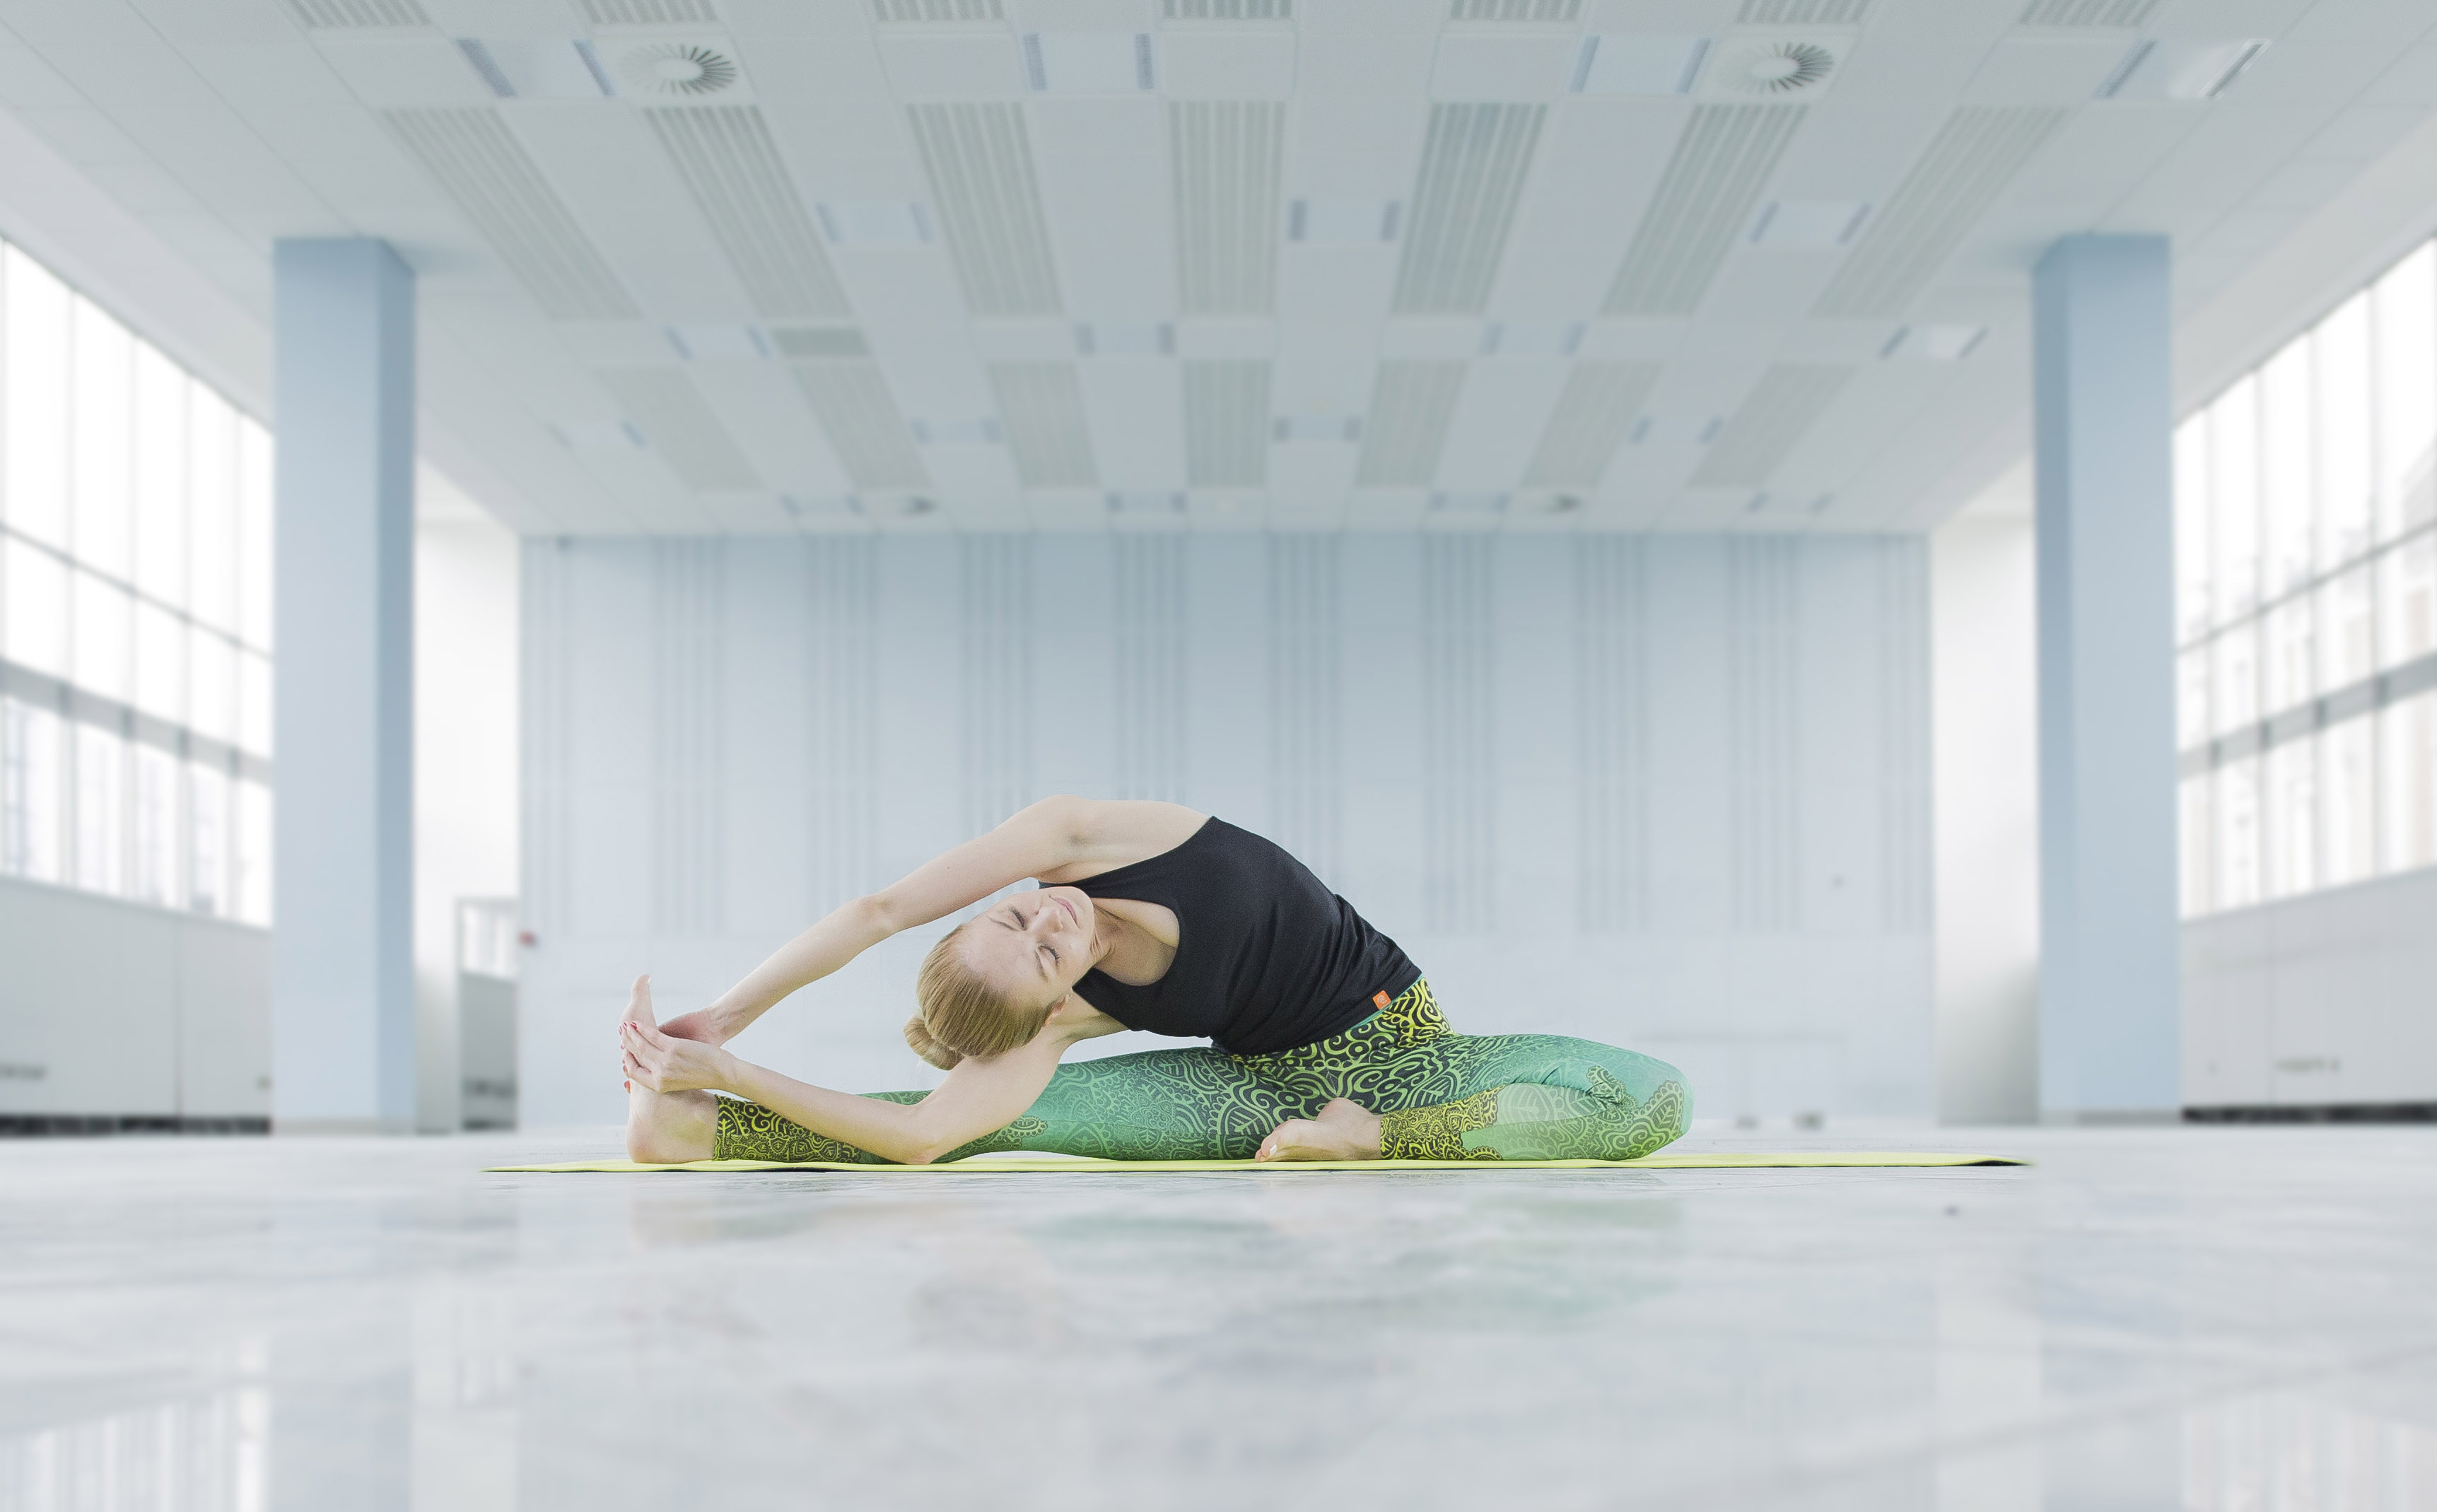 dzień jogi